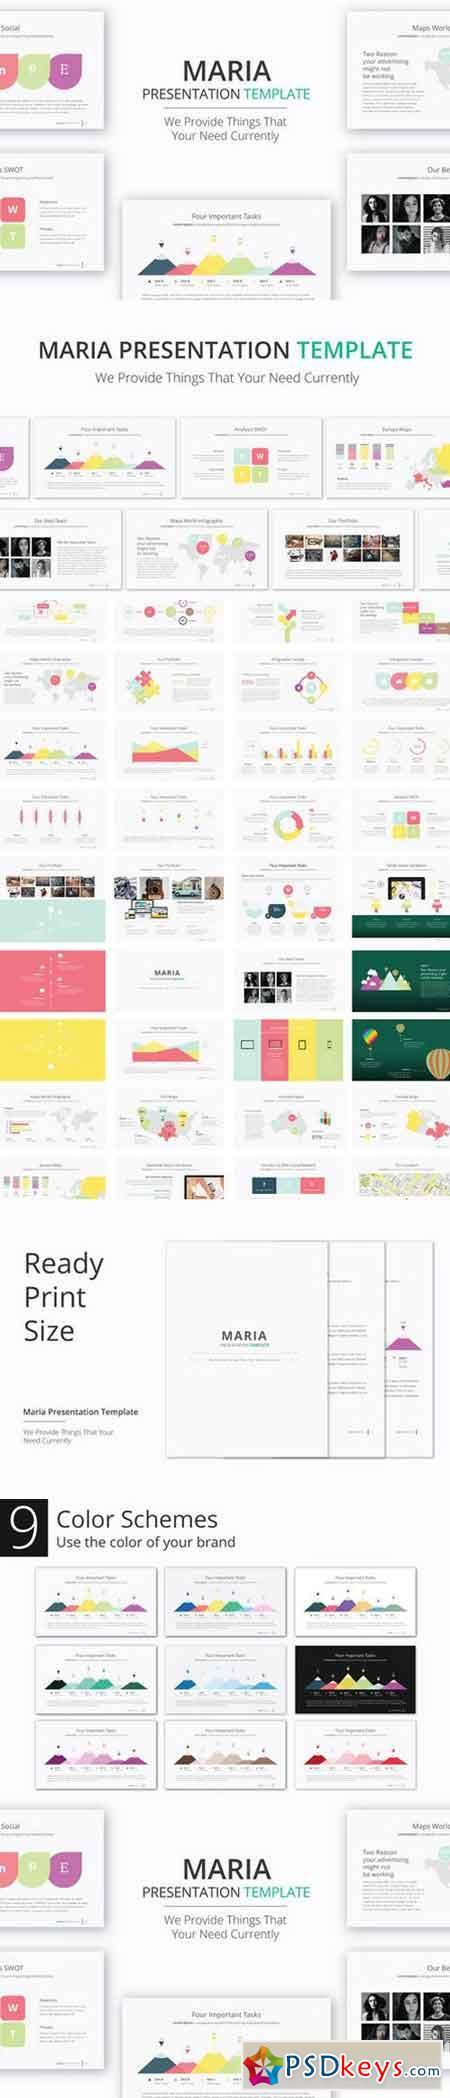 maria presentation template 894161 » free download photoshop, Presentation templates